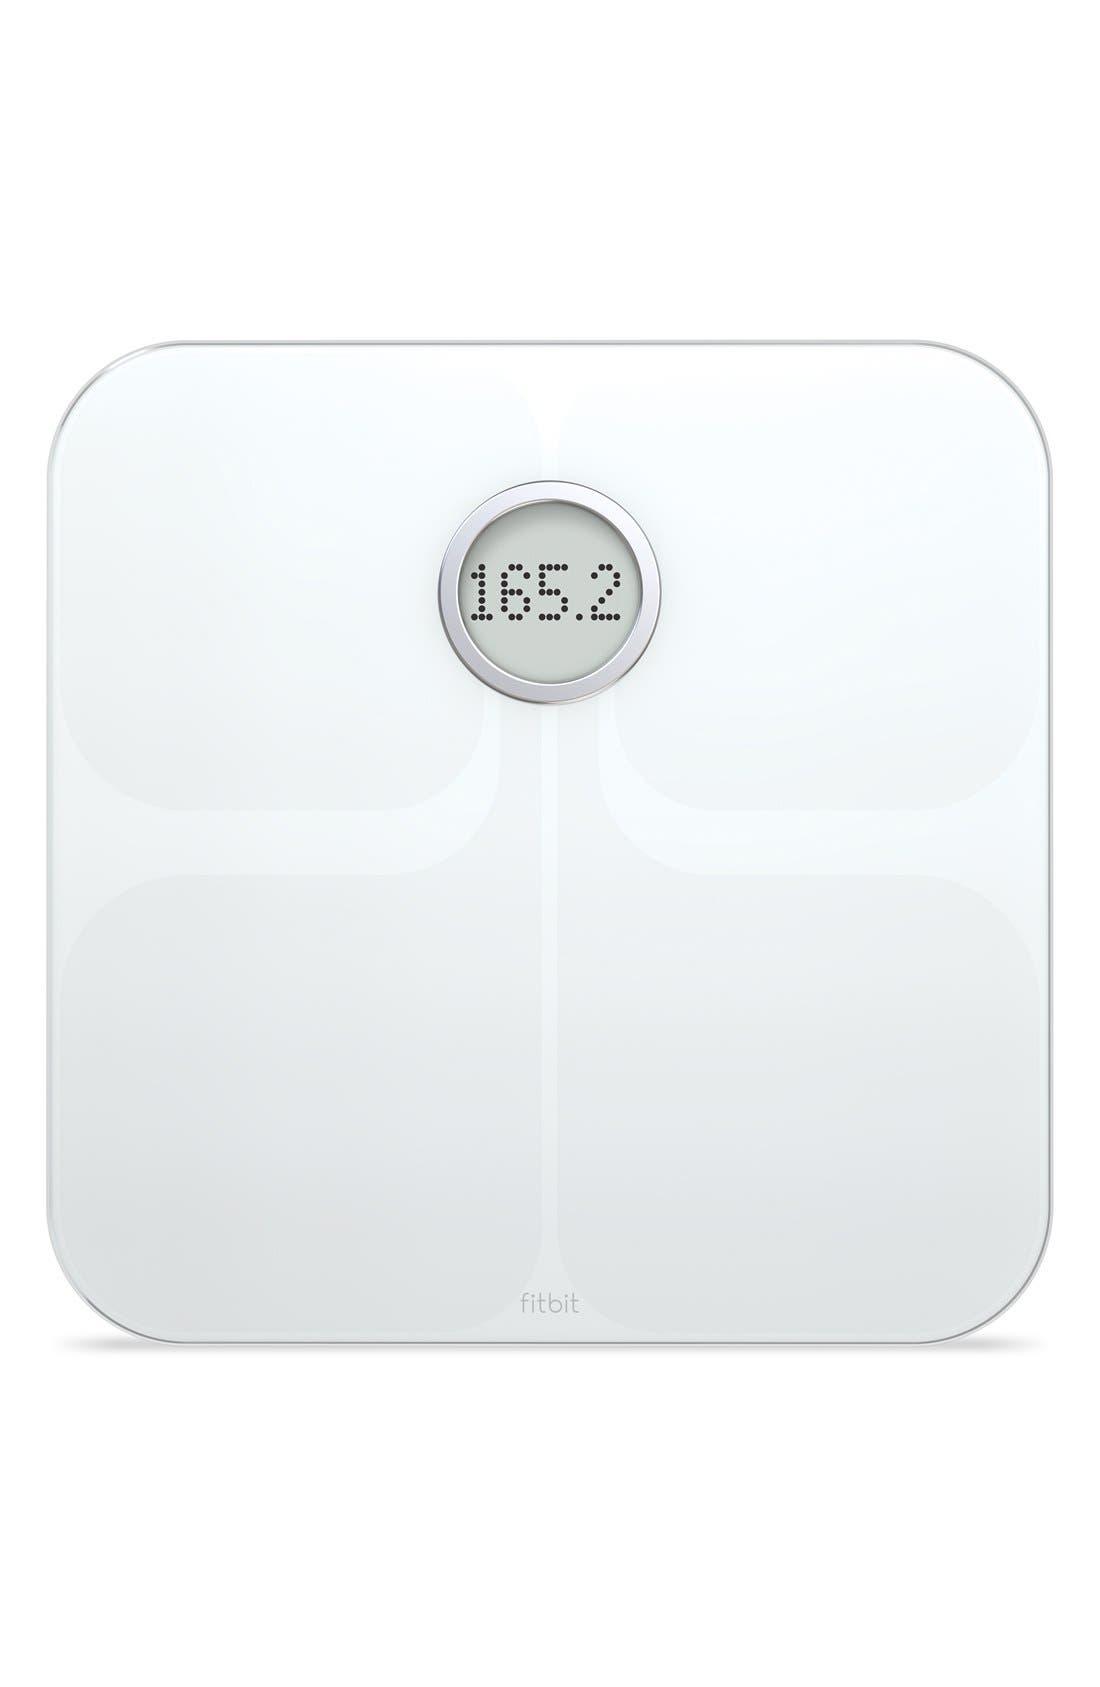 FITBIT Aria Wireless Smart Scale